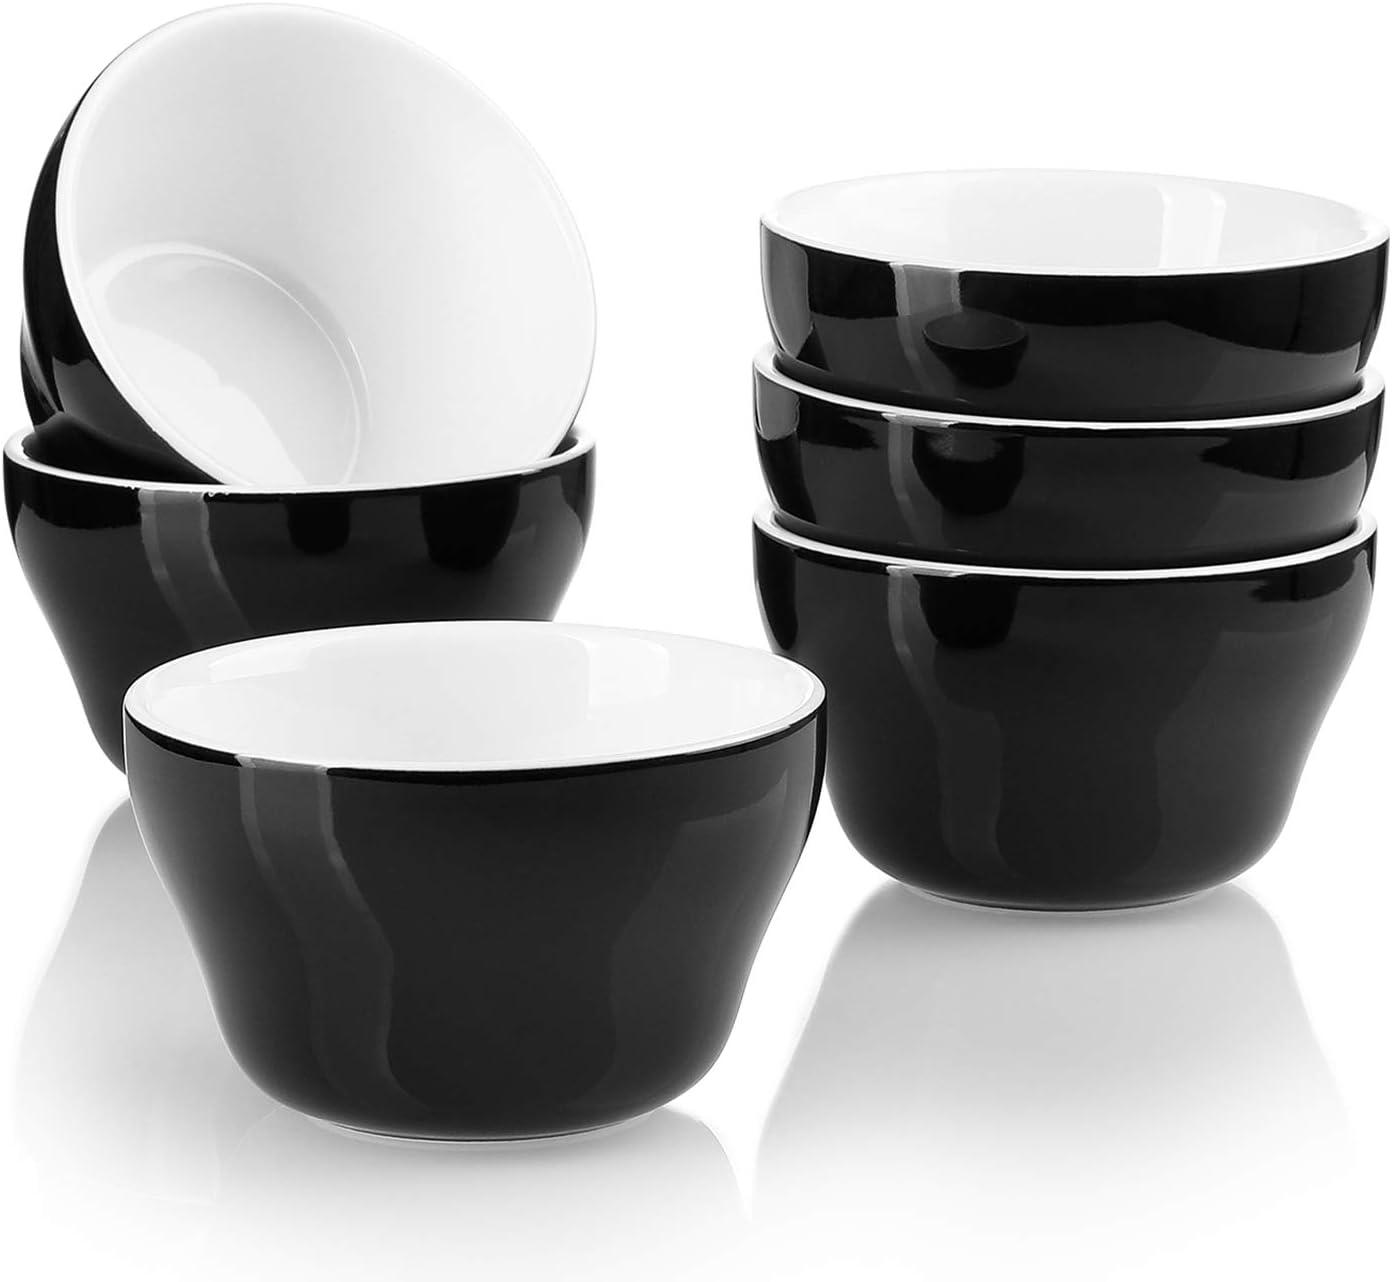 Sweese 107.612 Porcelain Bouillon Cups - 8 Ounce Dessert Bowls - Set of 6, Black